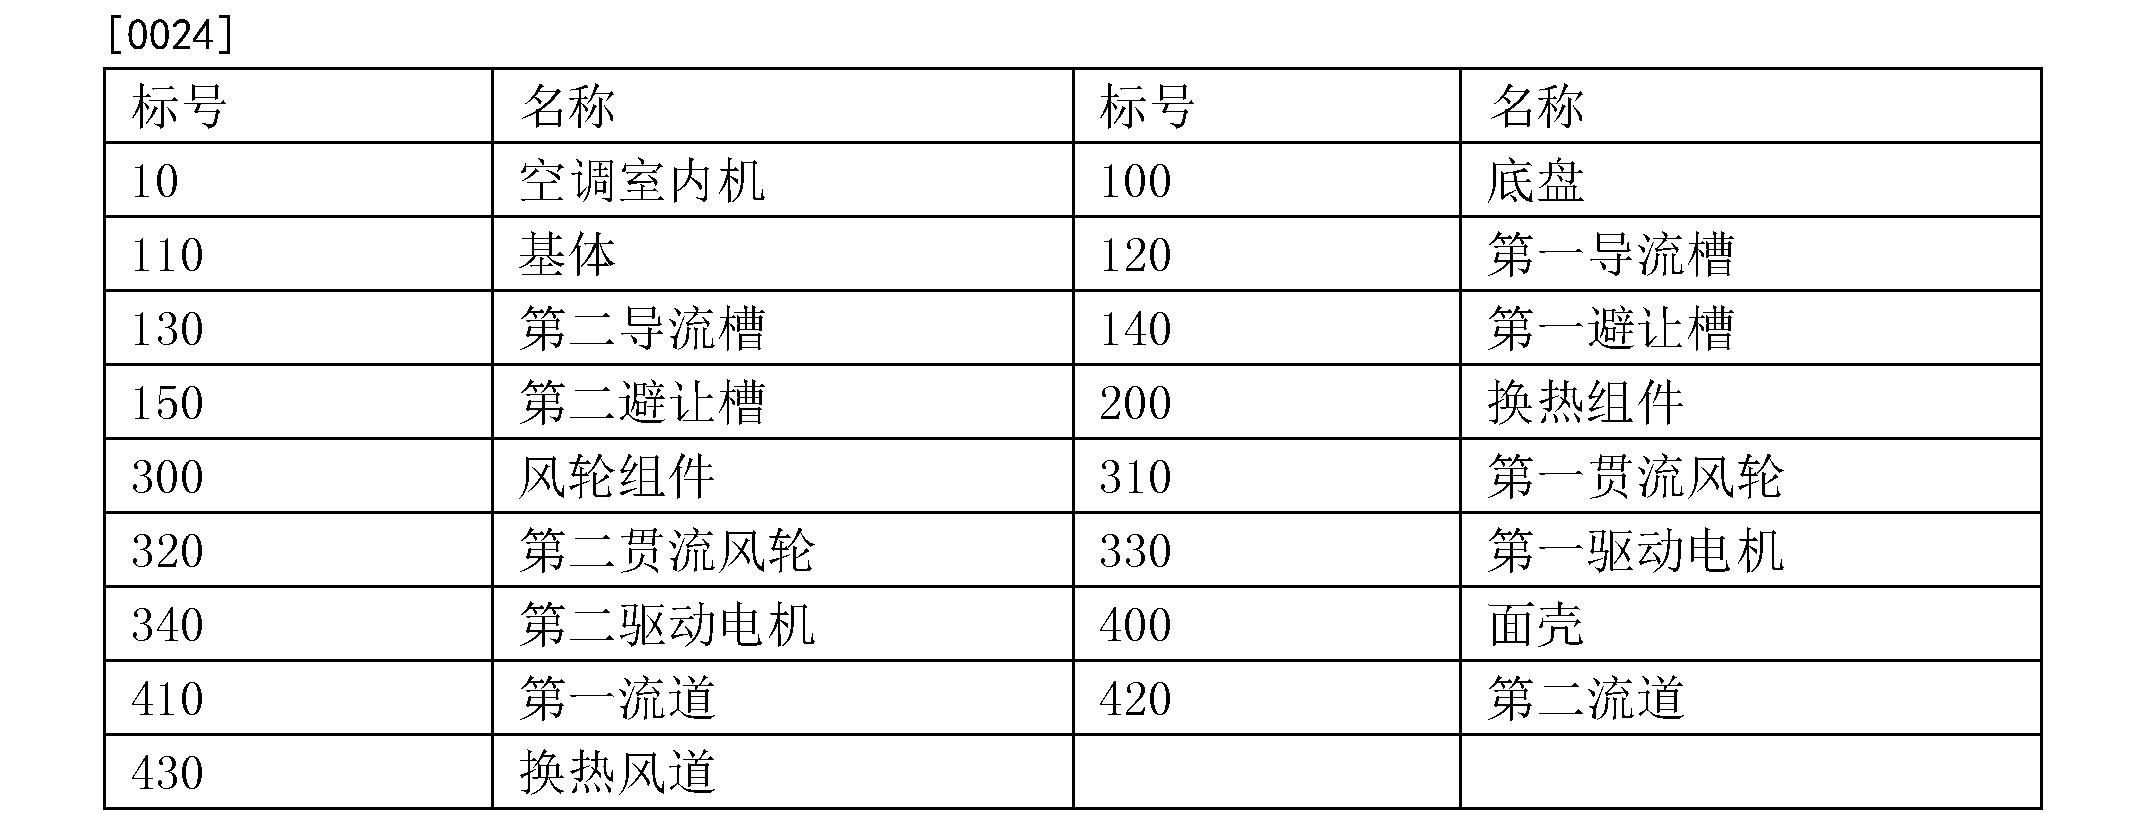 Figure CN205825234UD00041